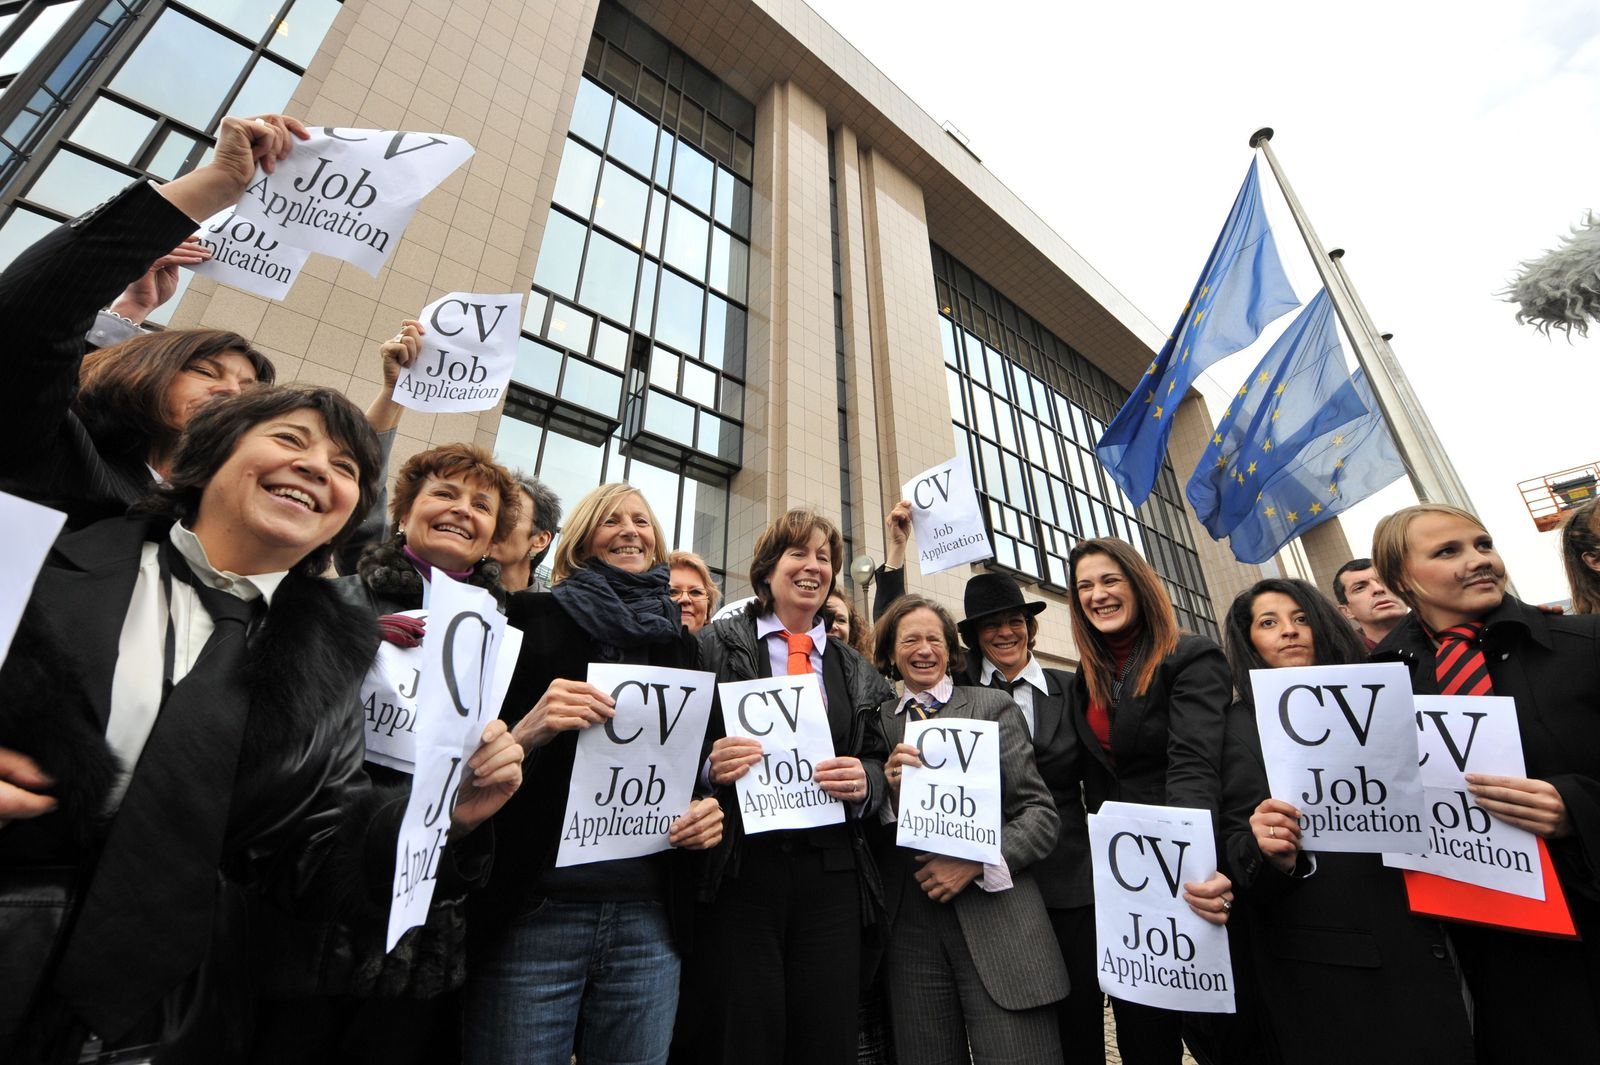 BRUSSELS-EU-WOMEN-DEMO-INSTITUTIONS